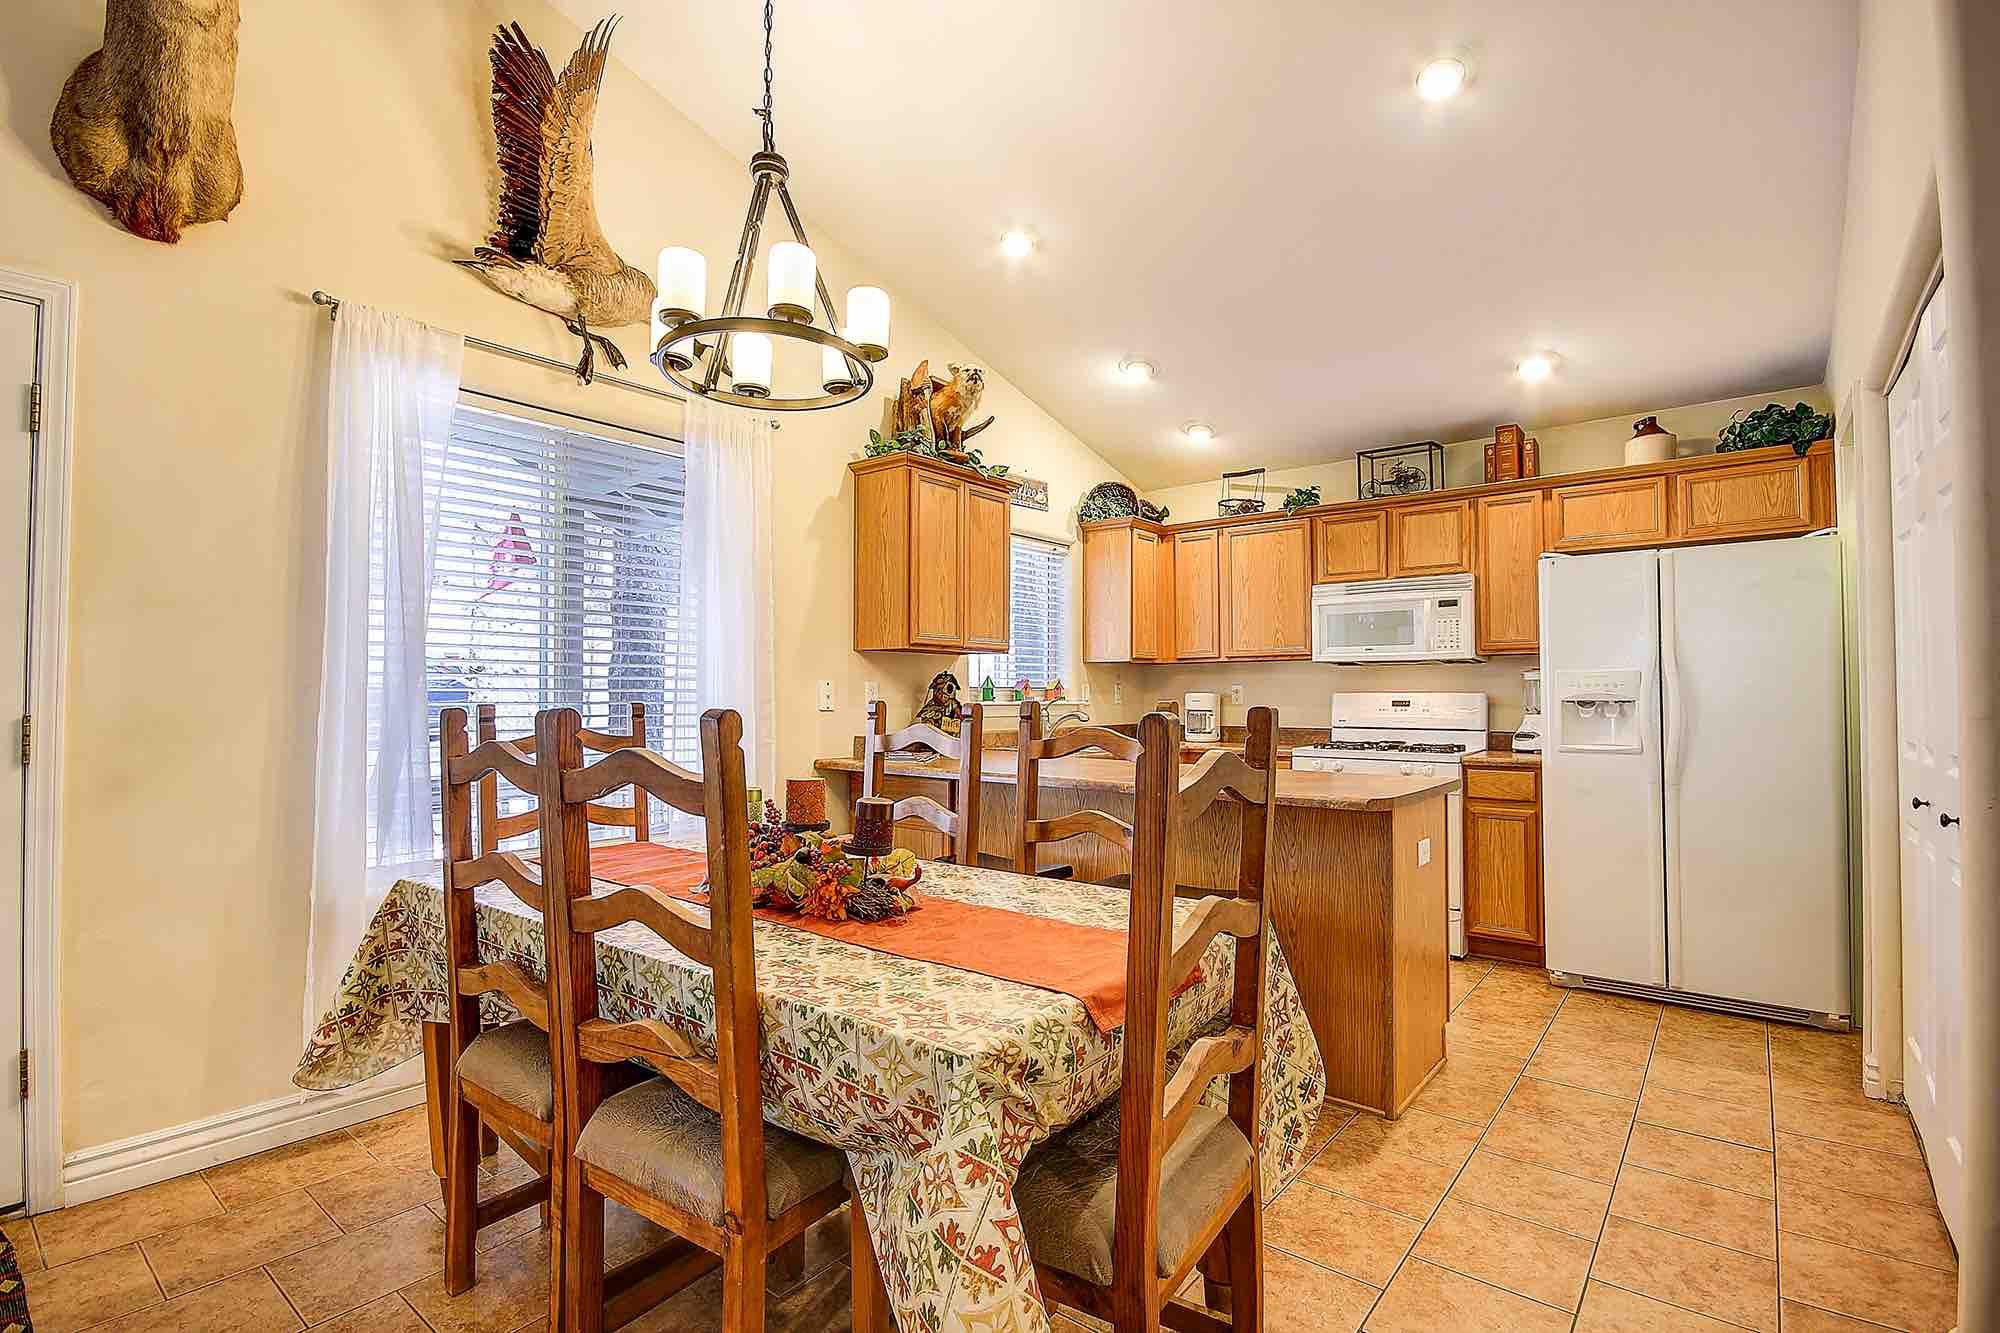 tourism cabins blog phantom in arizona ranch forest rentals cabin a rent service flagstaff